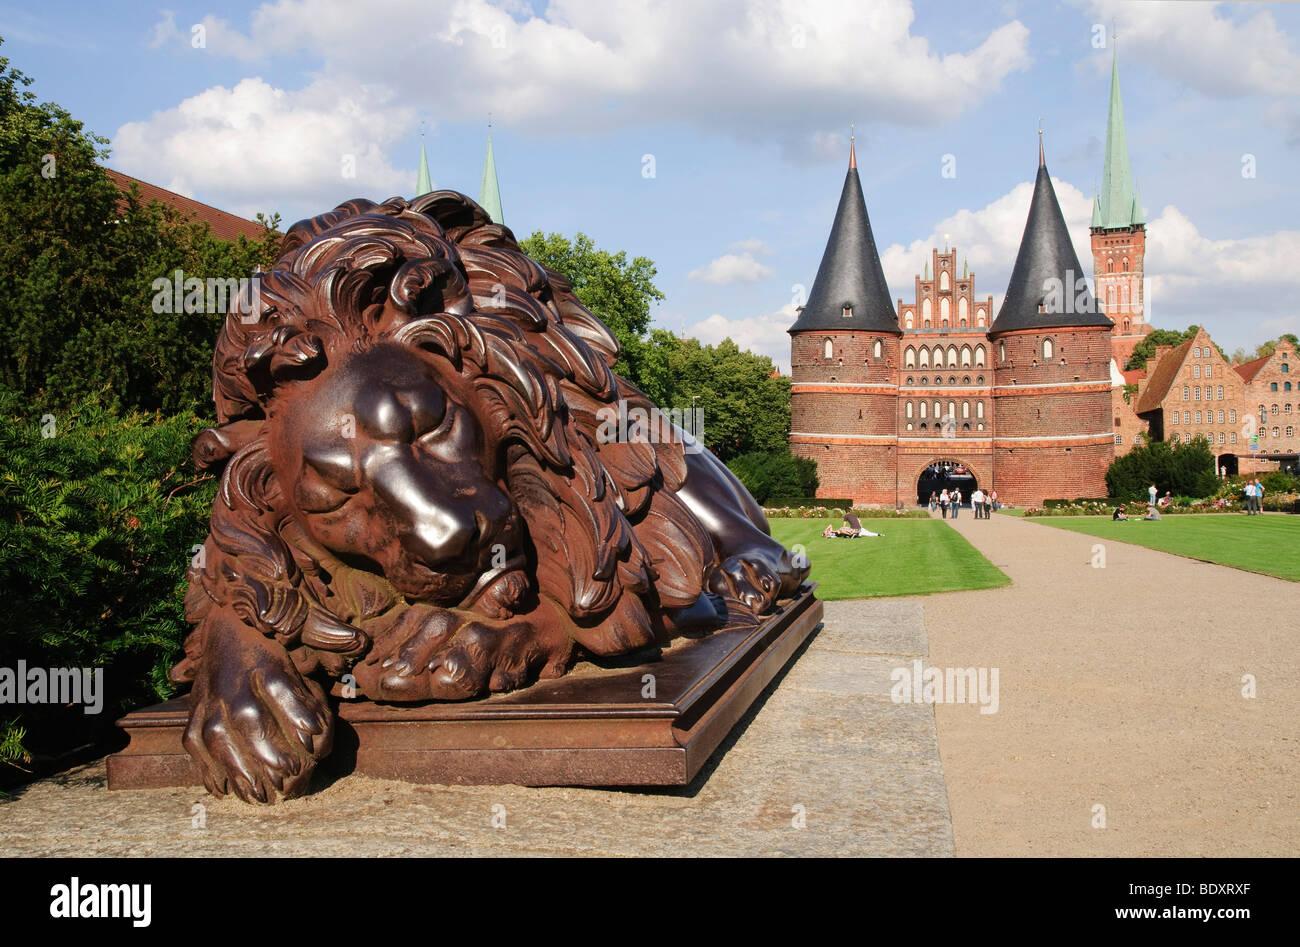 Sculpture Sleeping Lion in front of the Holstentor, Holsten Gate, in Luebeck, Schlewig-Holstein, Germany, Europe - Stock Image